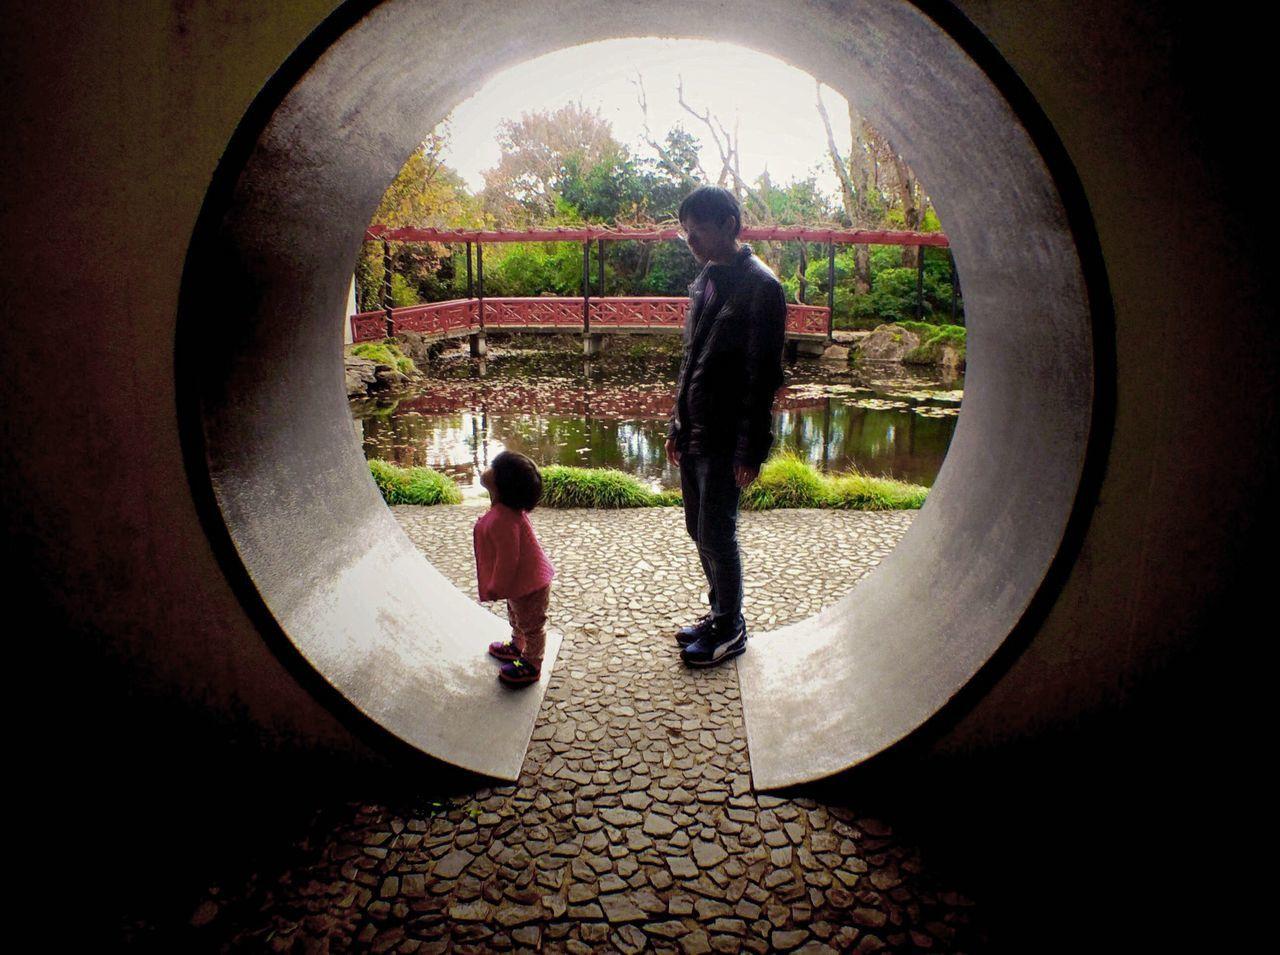 The Global EyeEm Adventure Waikato Hamiltongardens Hamilton Gardens Hamilton Chinese Garden Father And Daughter EEA3_CambridgeNZ EEA3 Fall Beauty Ipadphotography